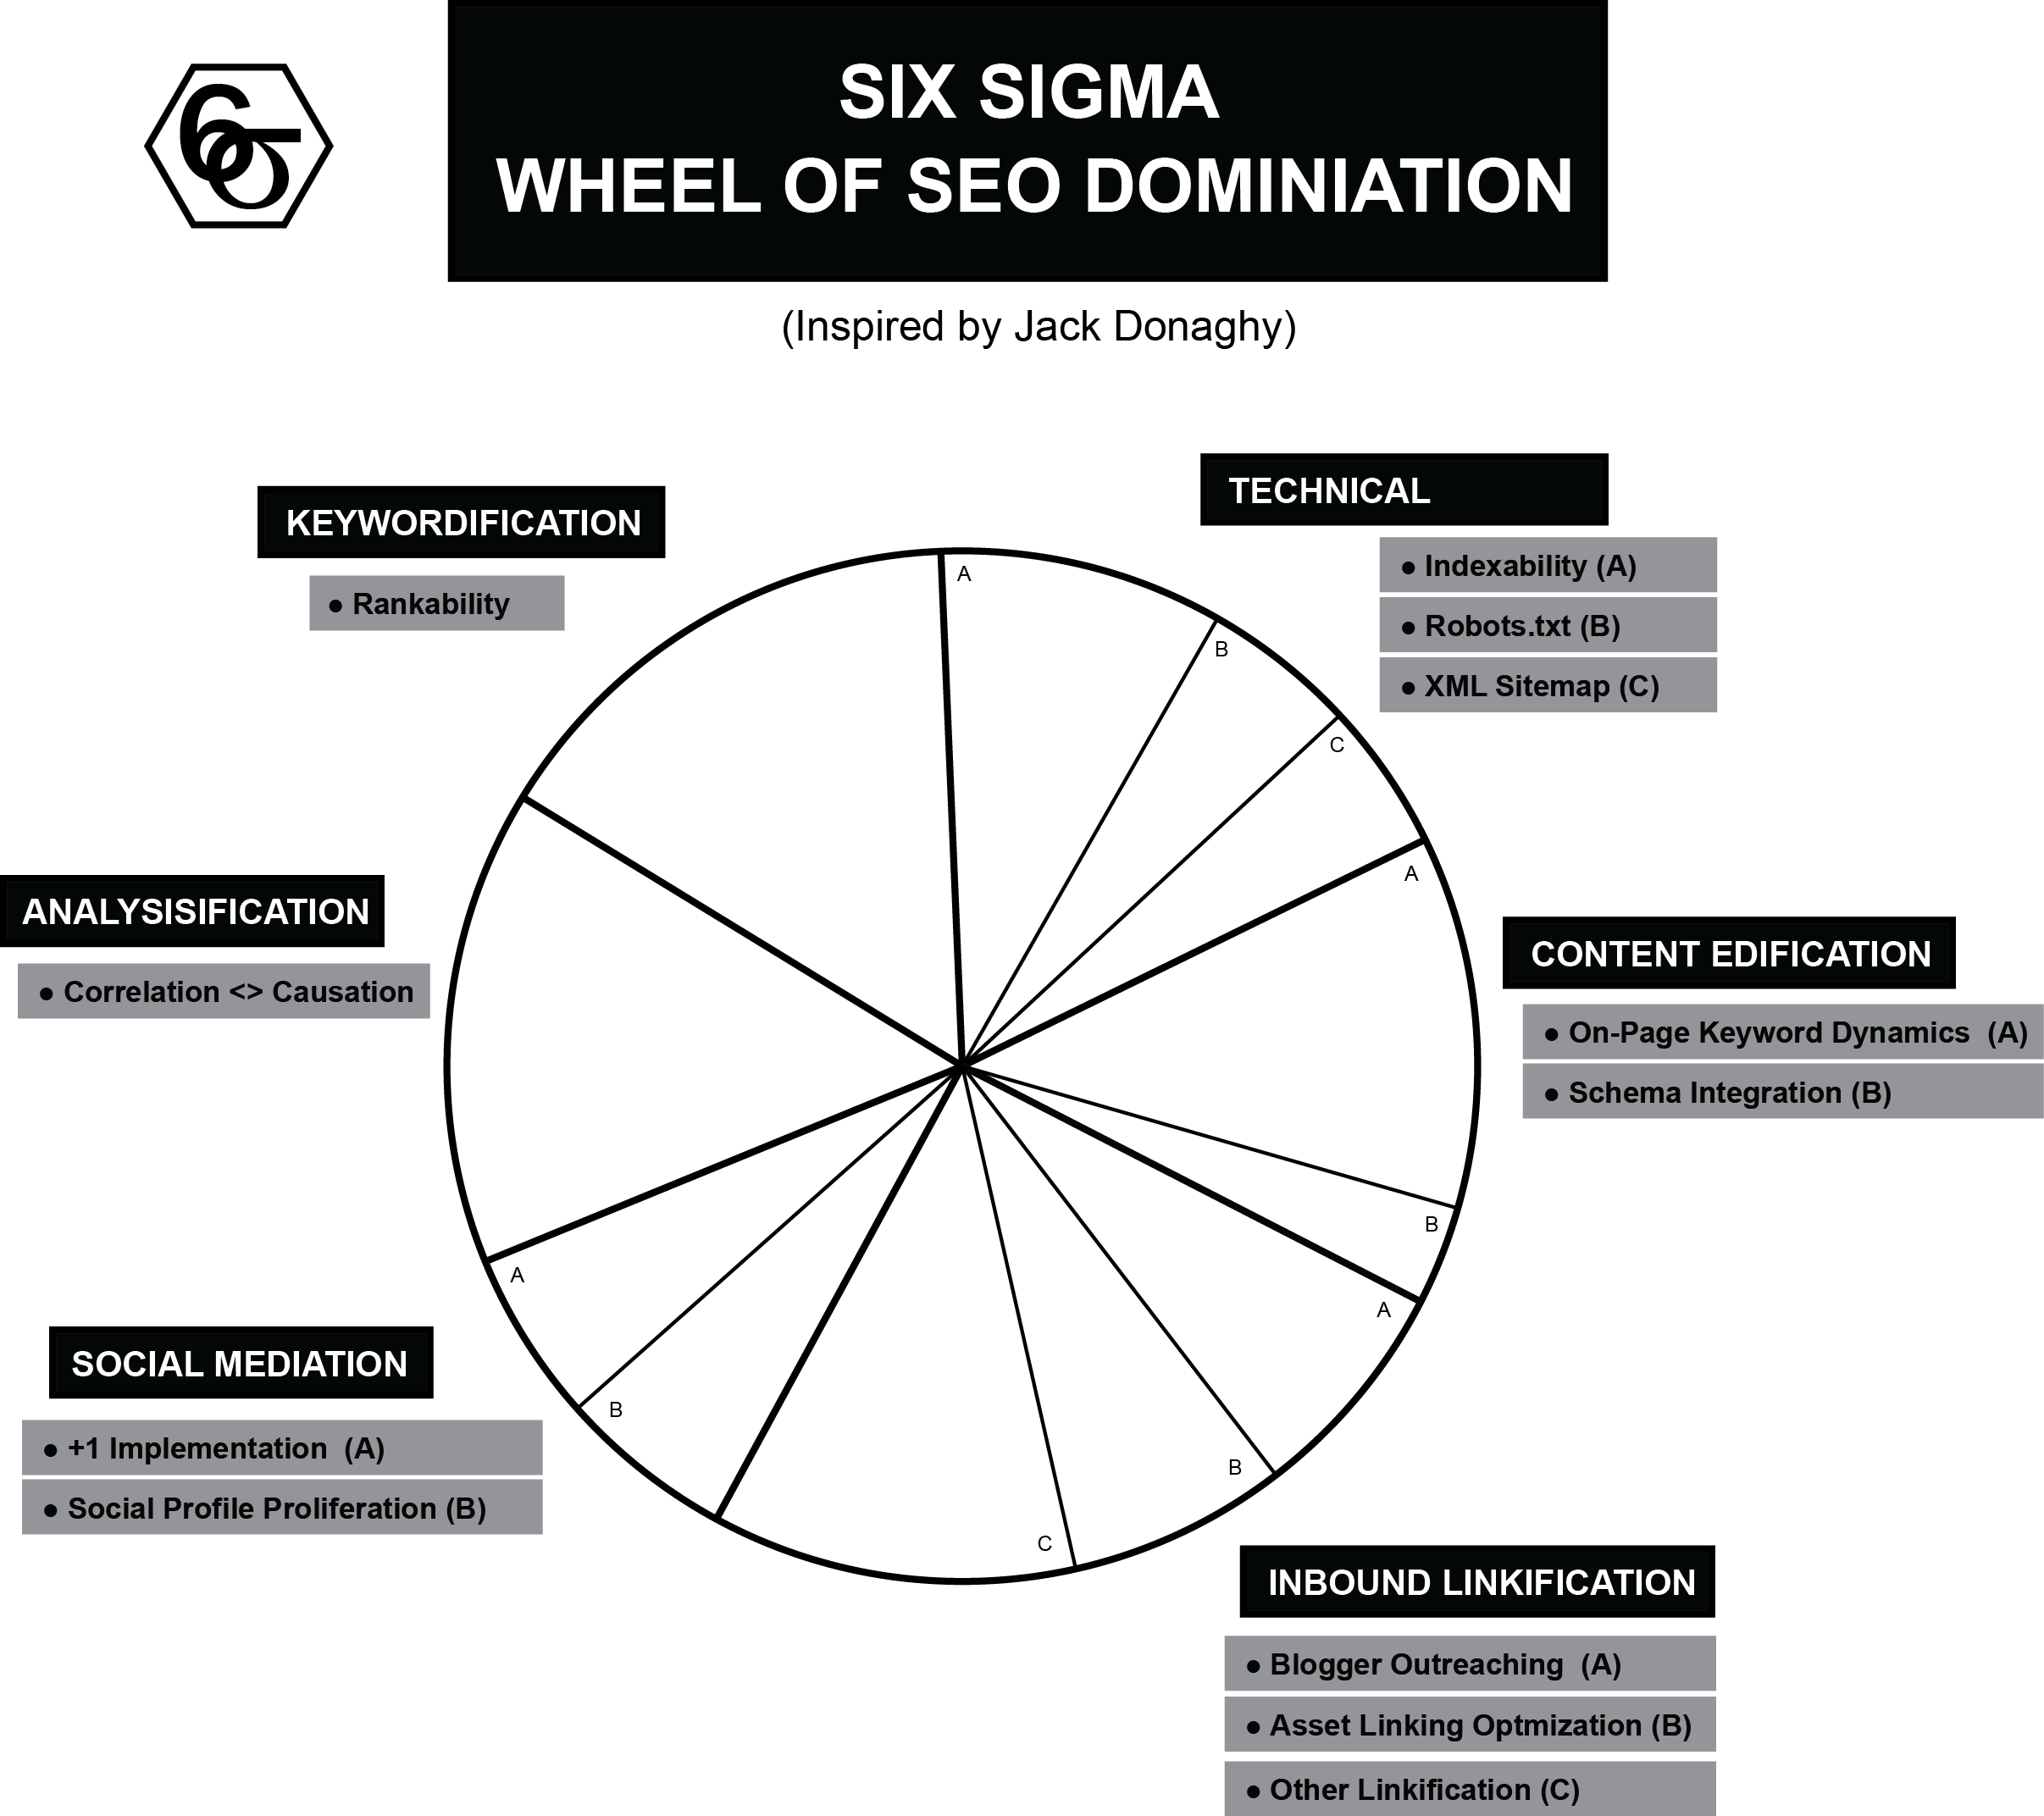 SEO Wheel of Domination